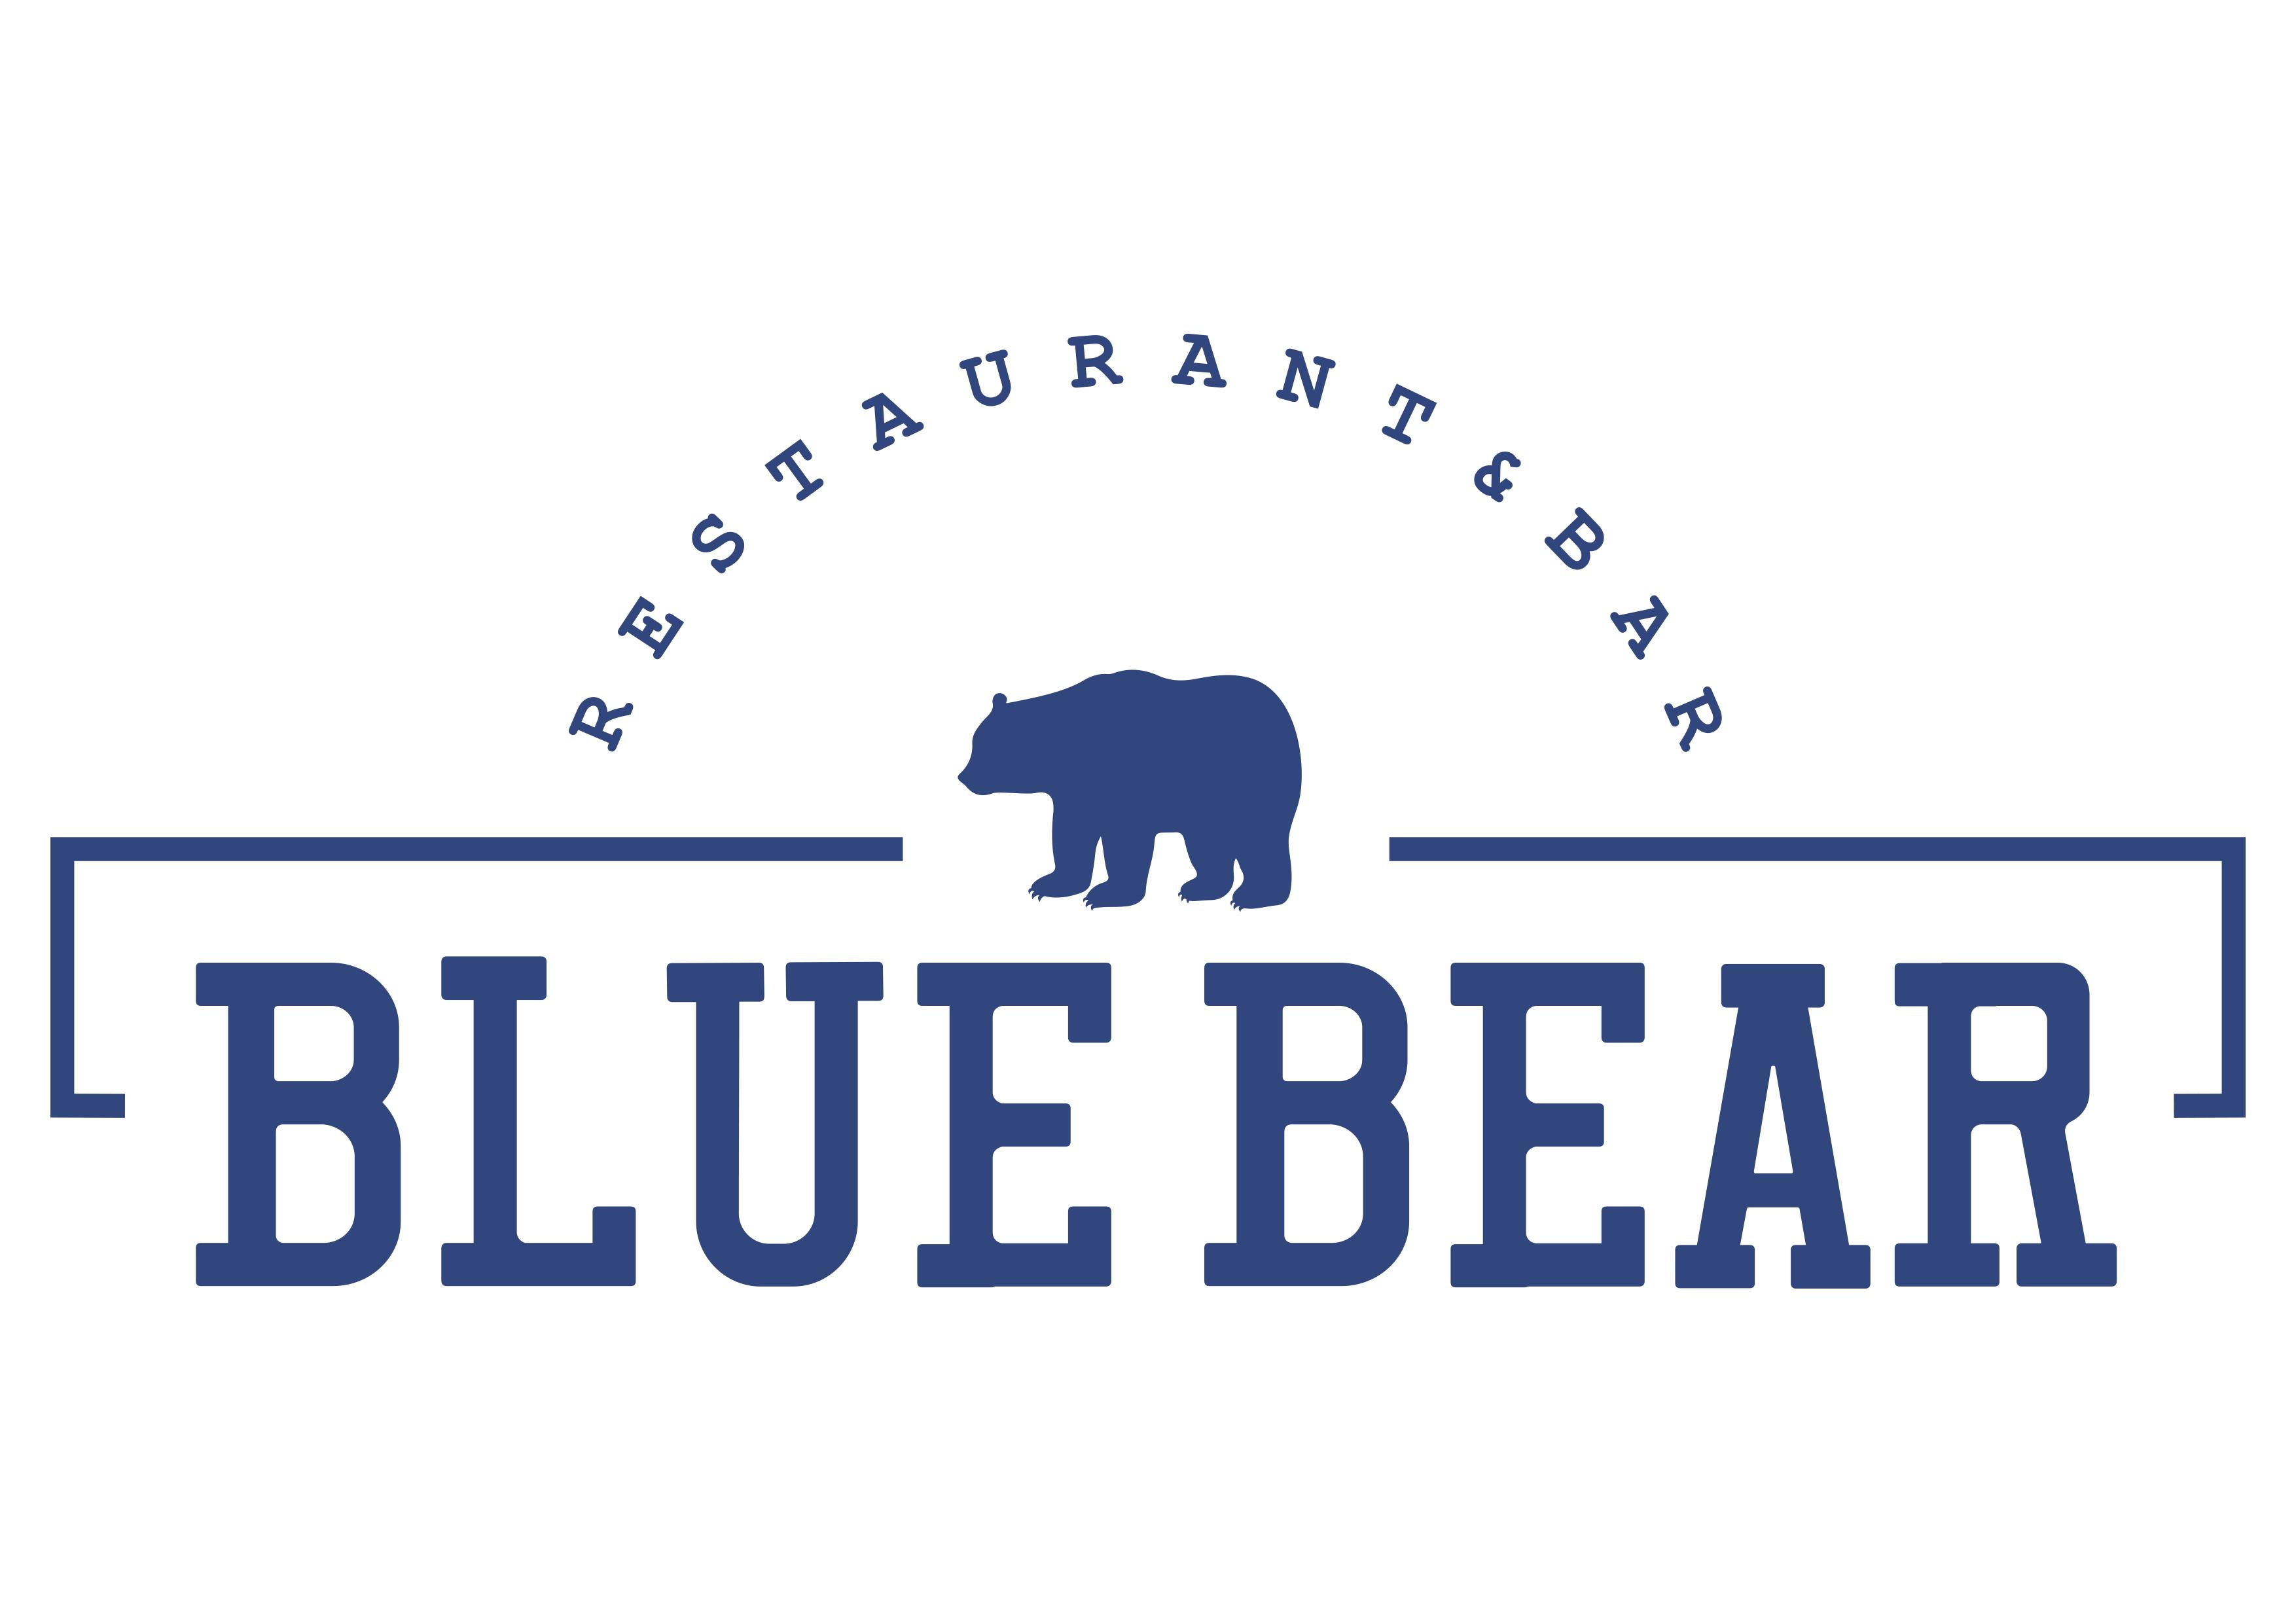 Blue Bear Restaurant & Bar